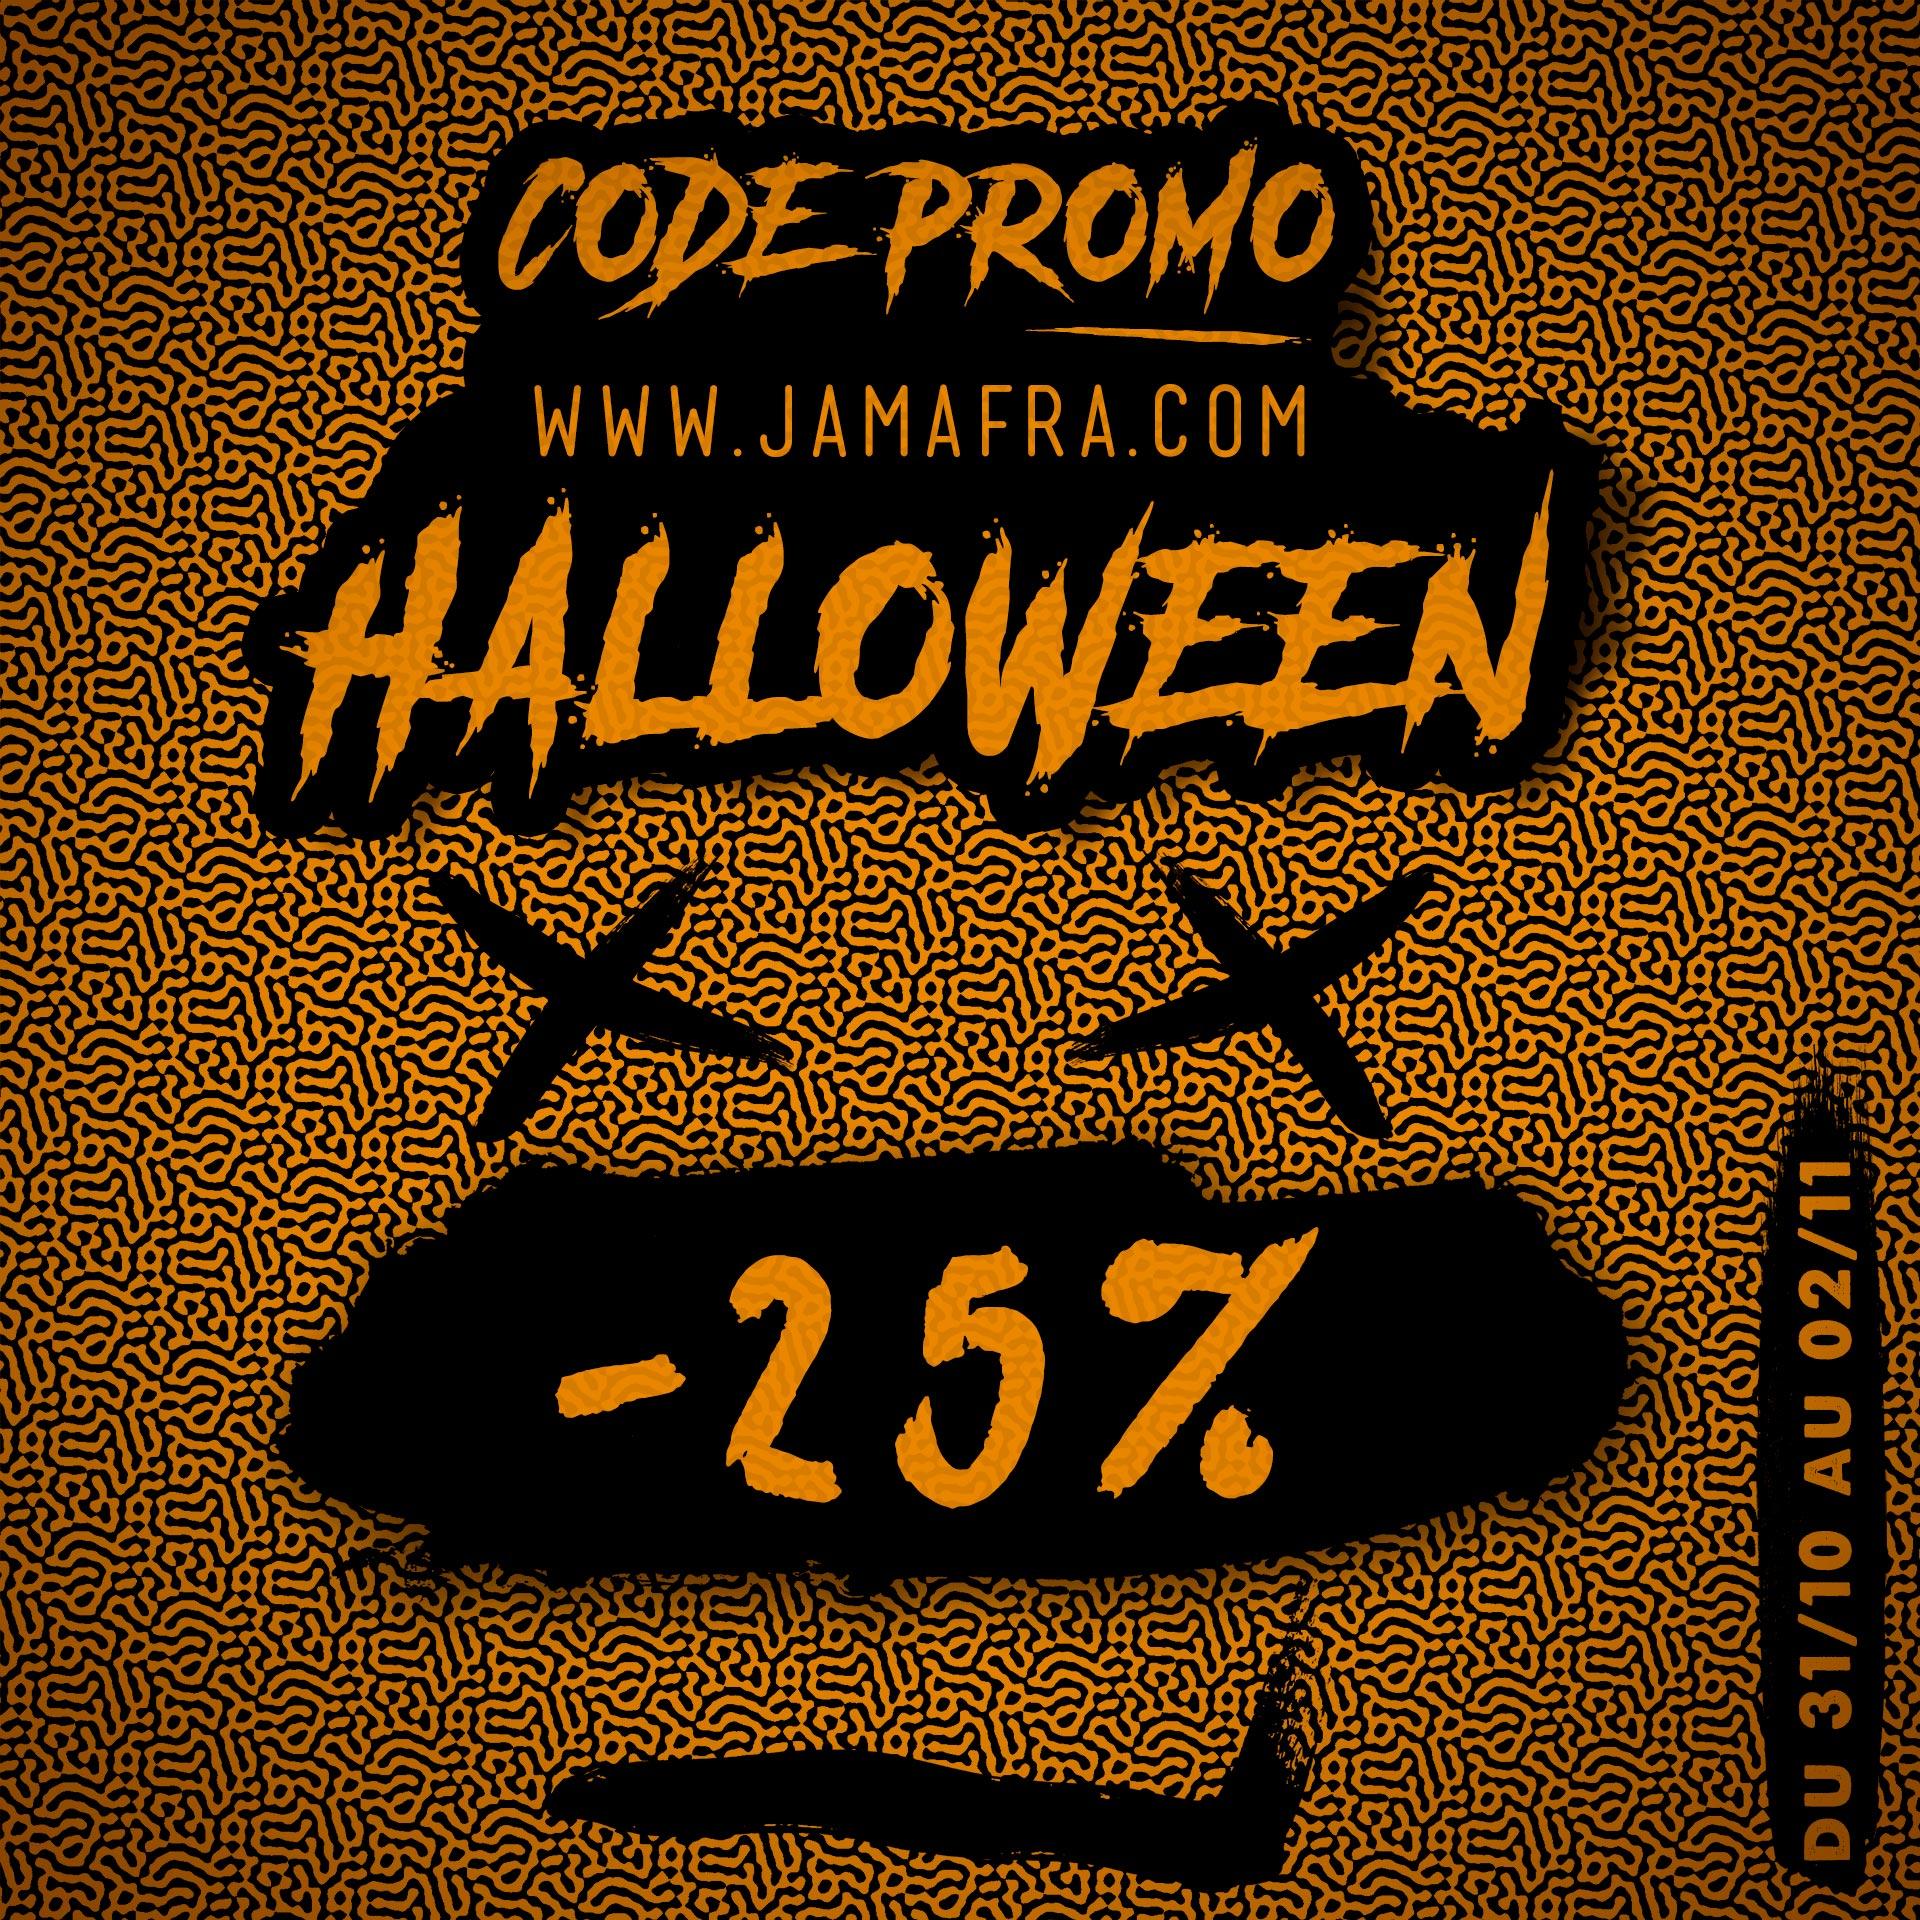 Code Promo Jamafra HALLOWEEN